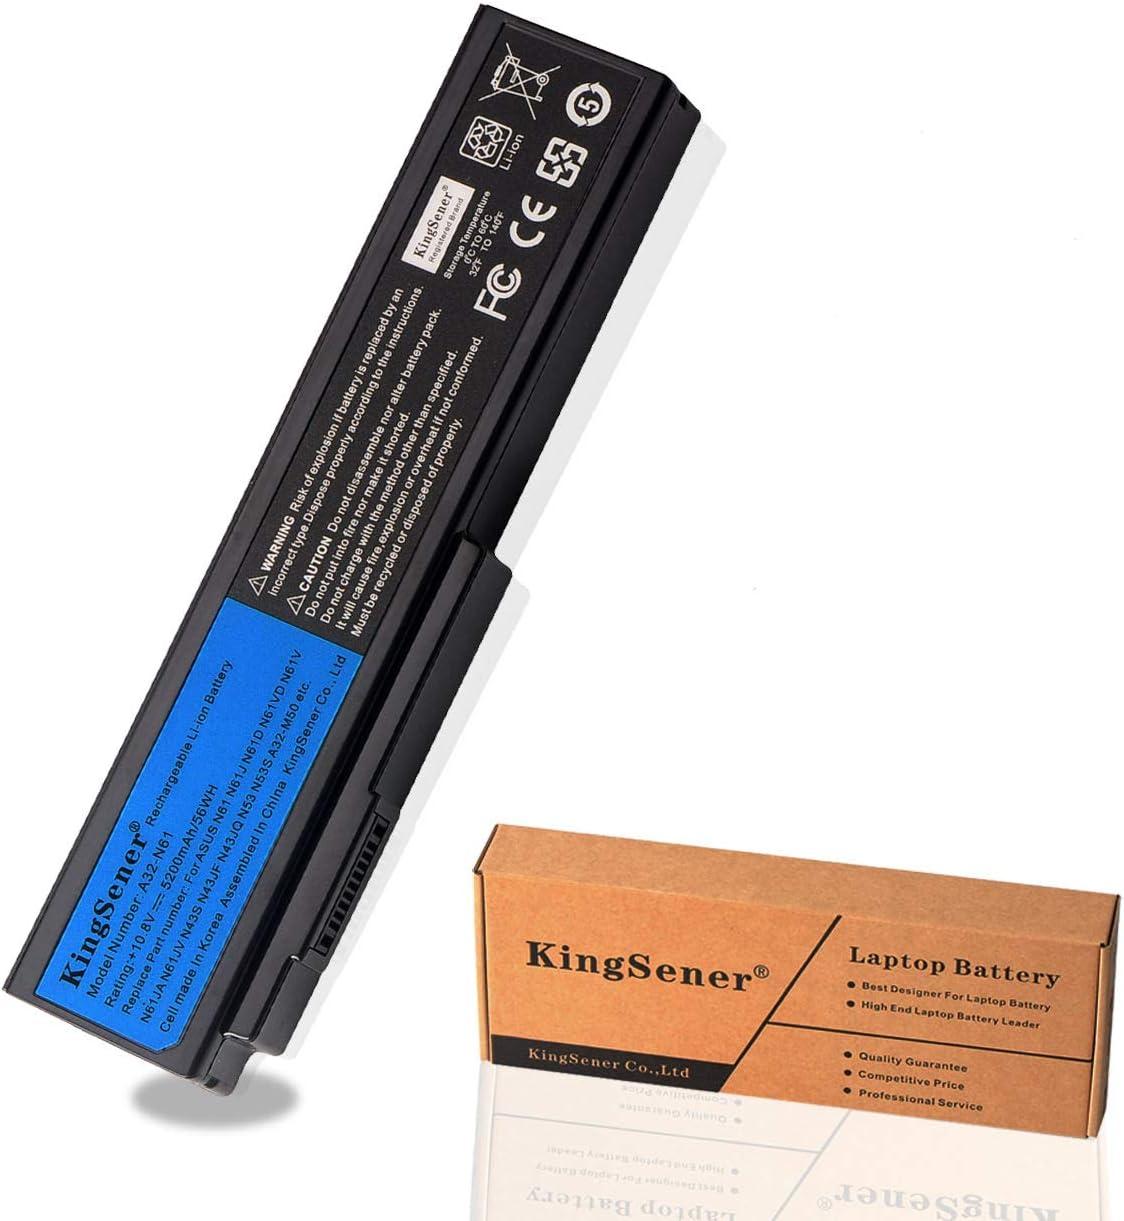 KingSener A32-N61 Battery for Asus N61 N61J N61D N61V N61VG N61JA N61JV M50s N43S N43JF N43JQ N53 N53S N53SV A32-M50 A32-X64